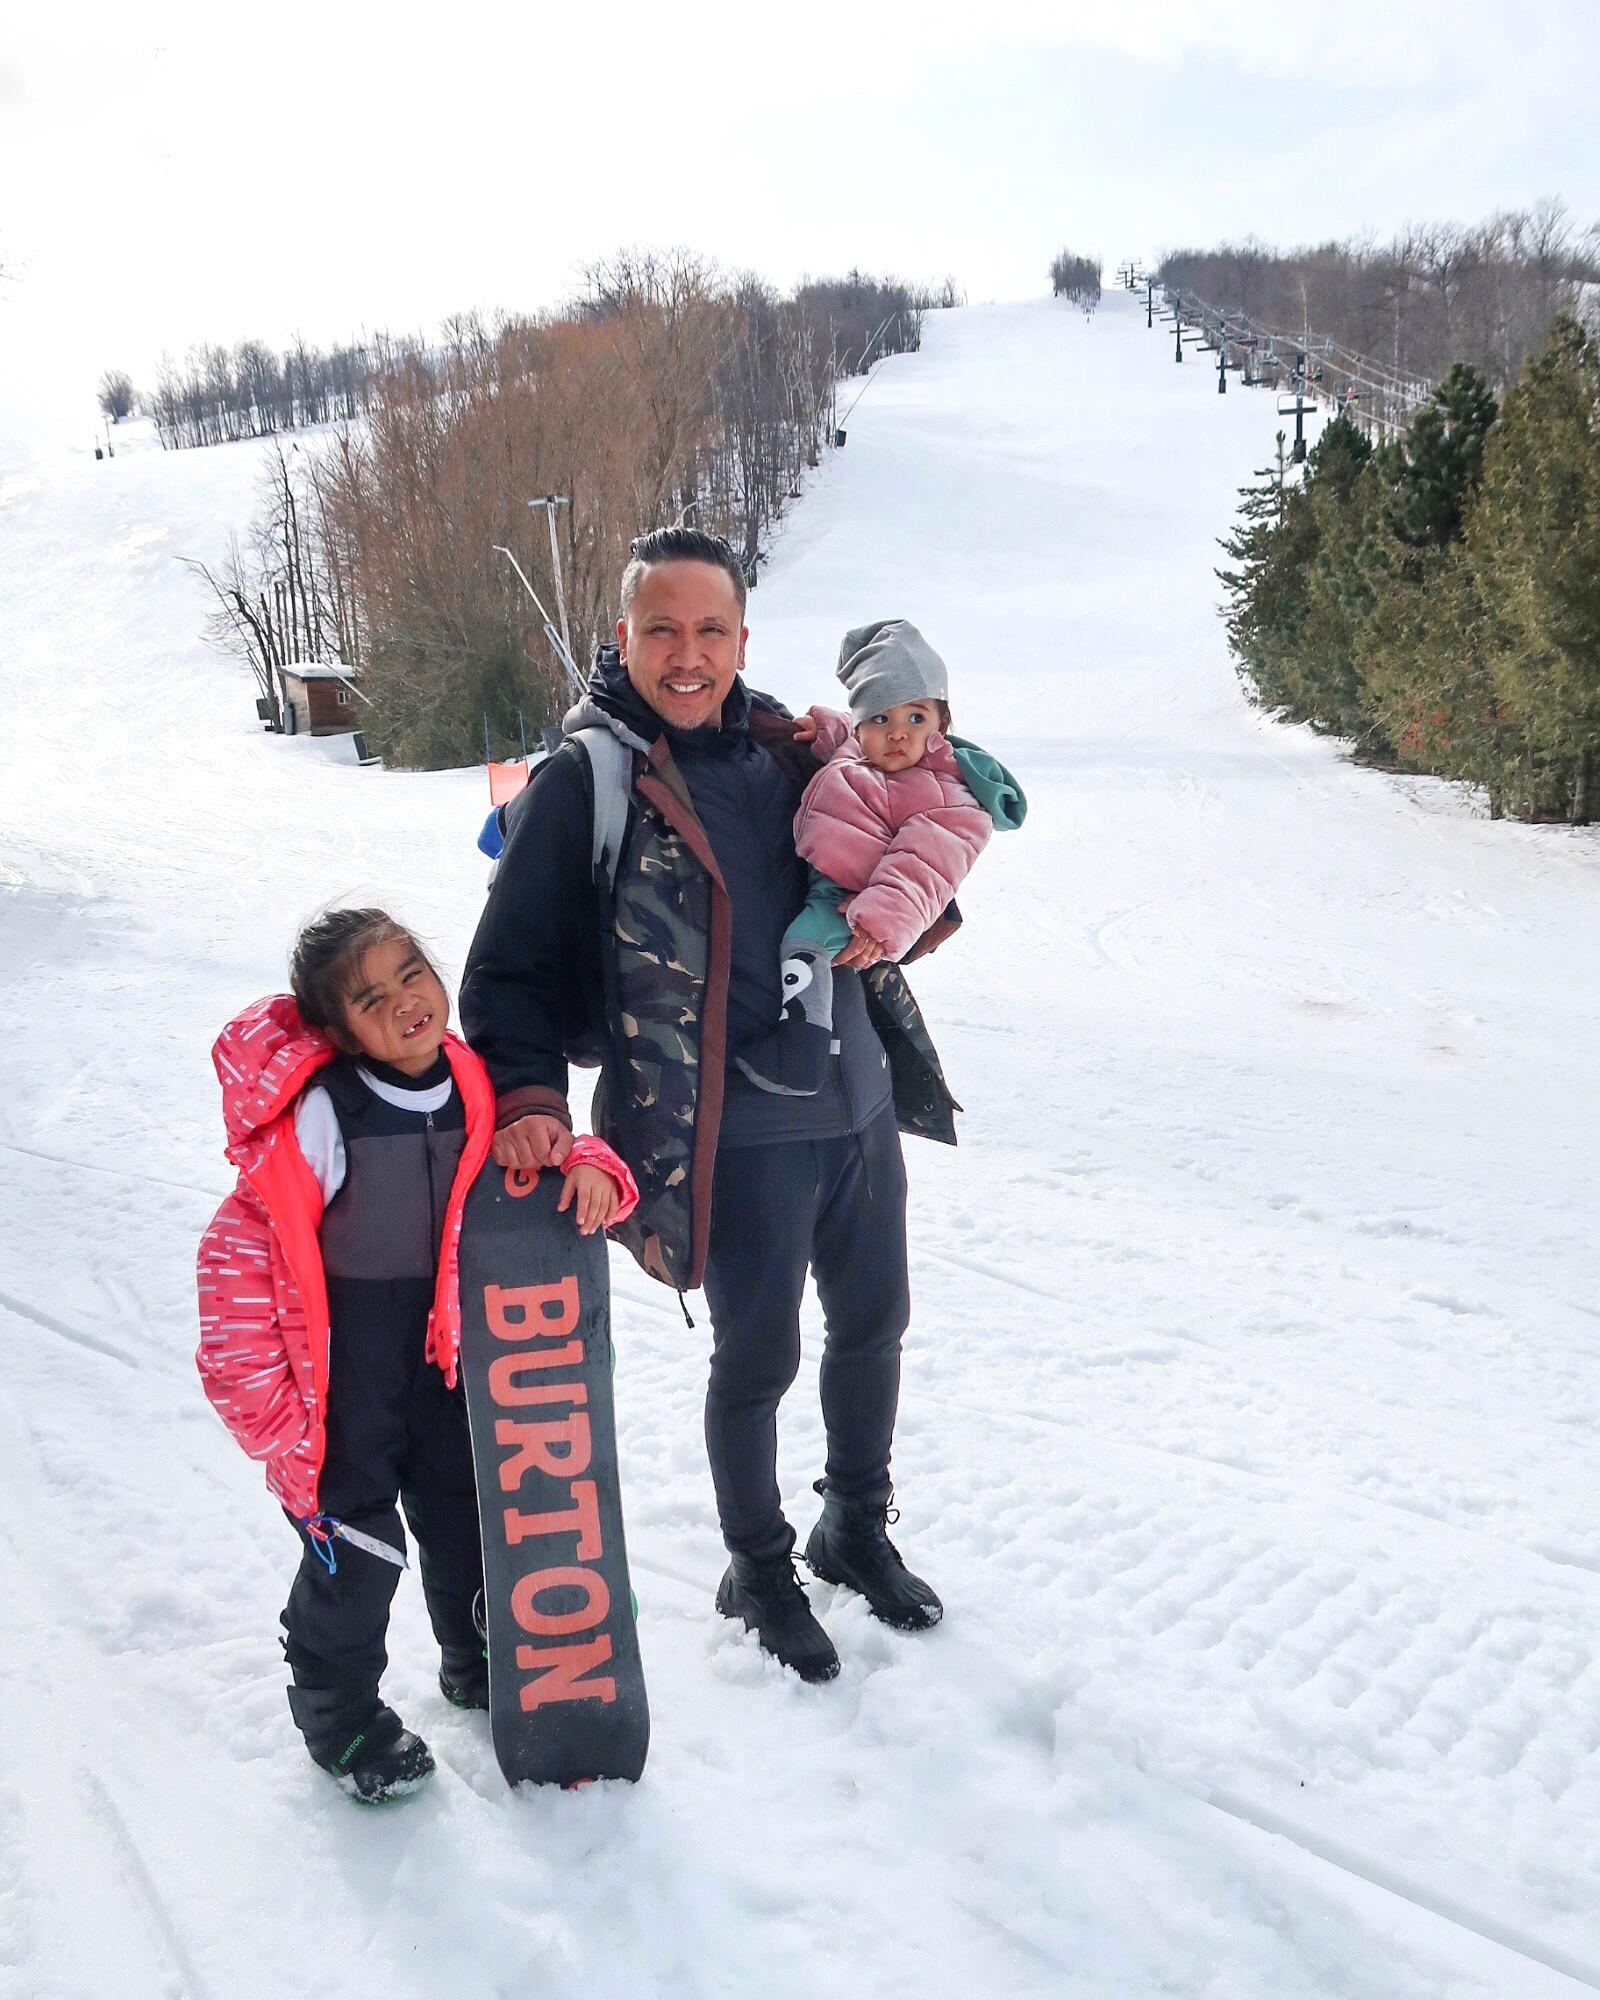 Family fun on the slopes!